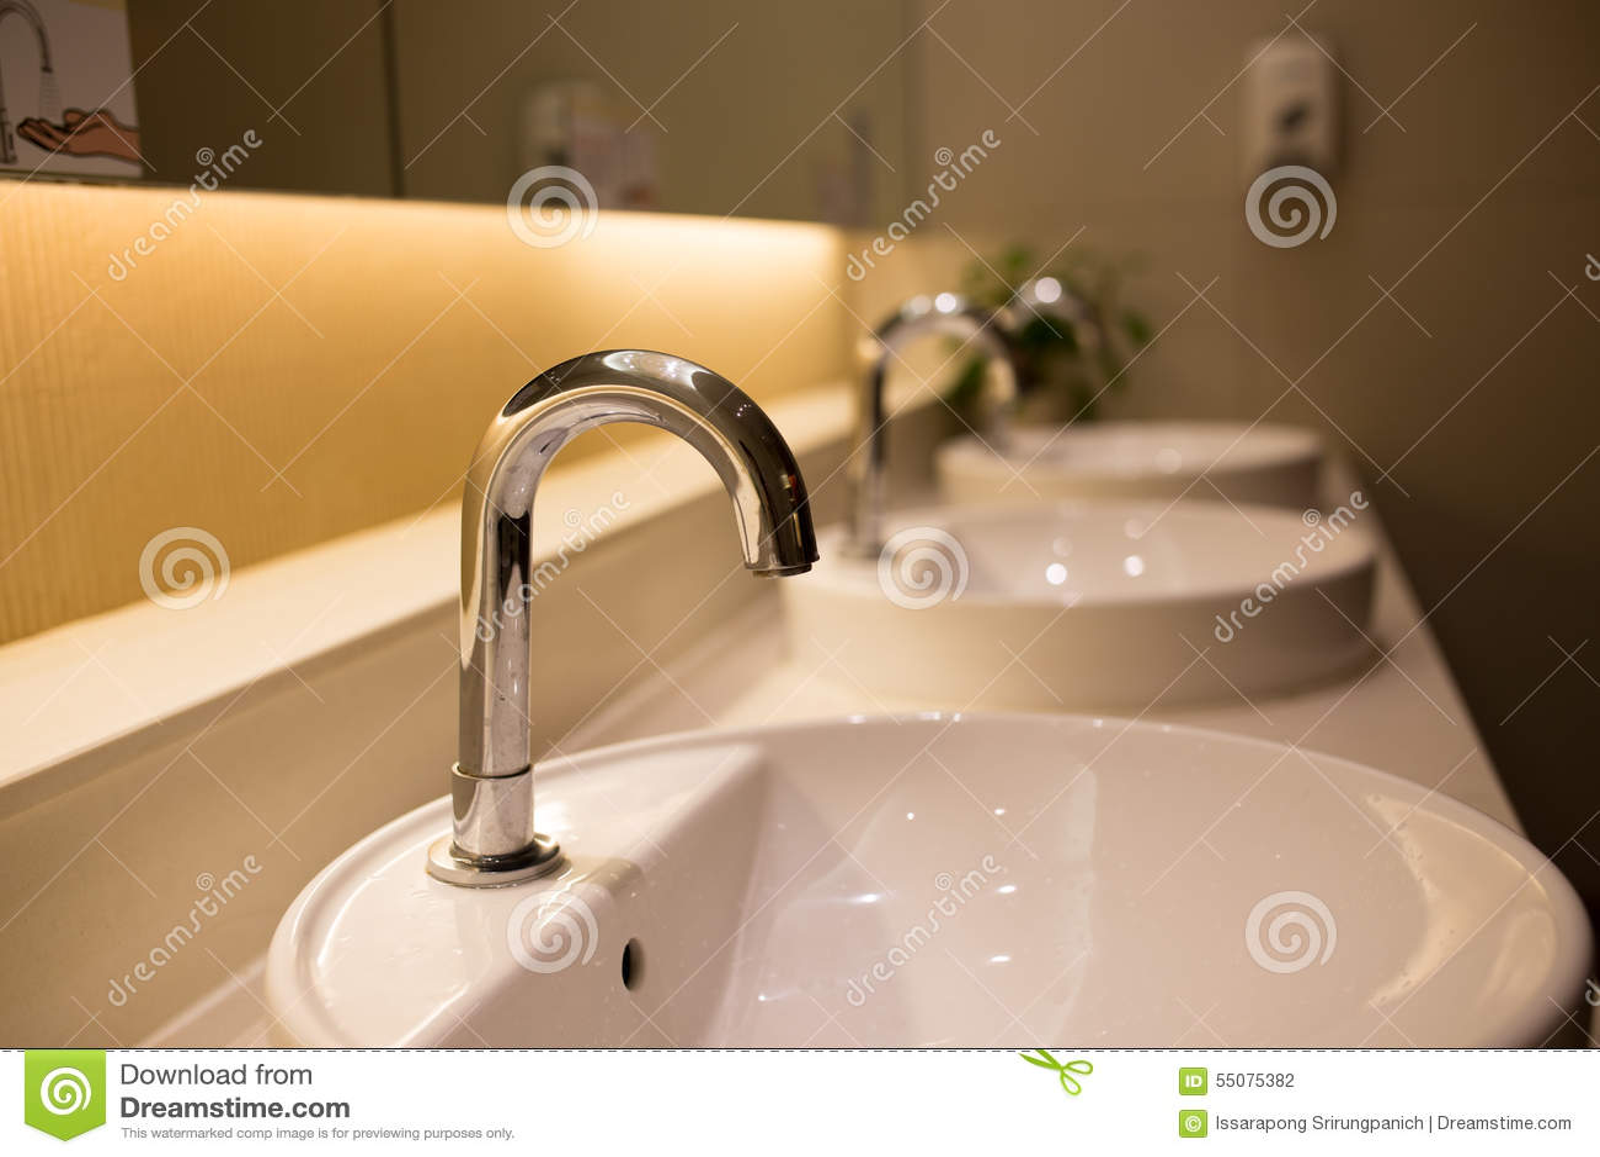 Row of sinks stock photo. Image of bathroom, monochrome - 55075382